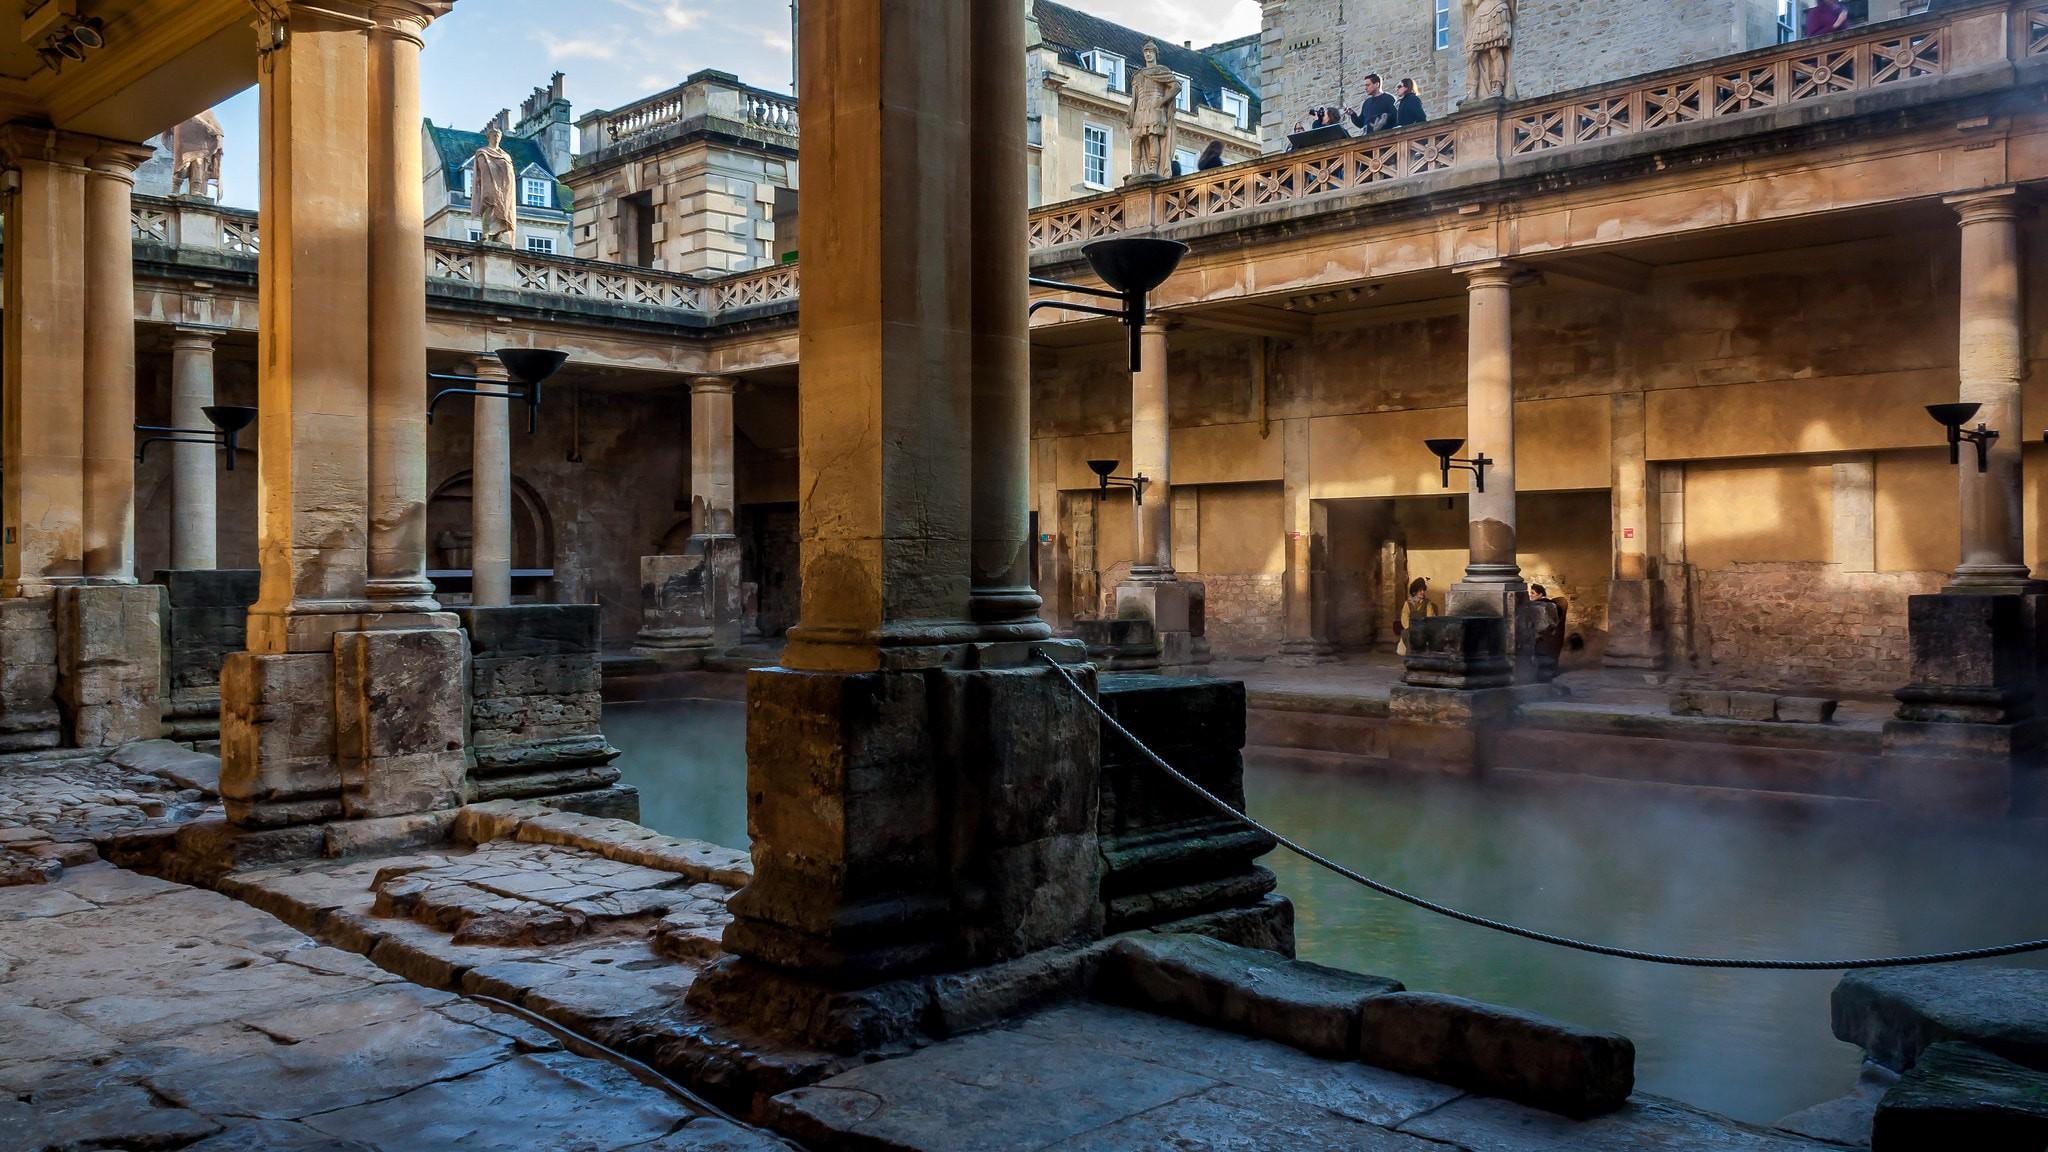 The Story Behind the Roman Baths in Bath